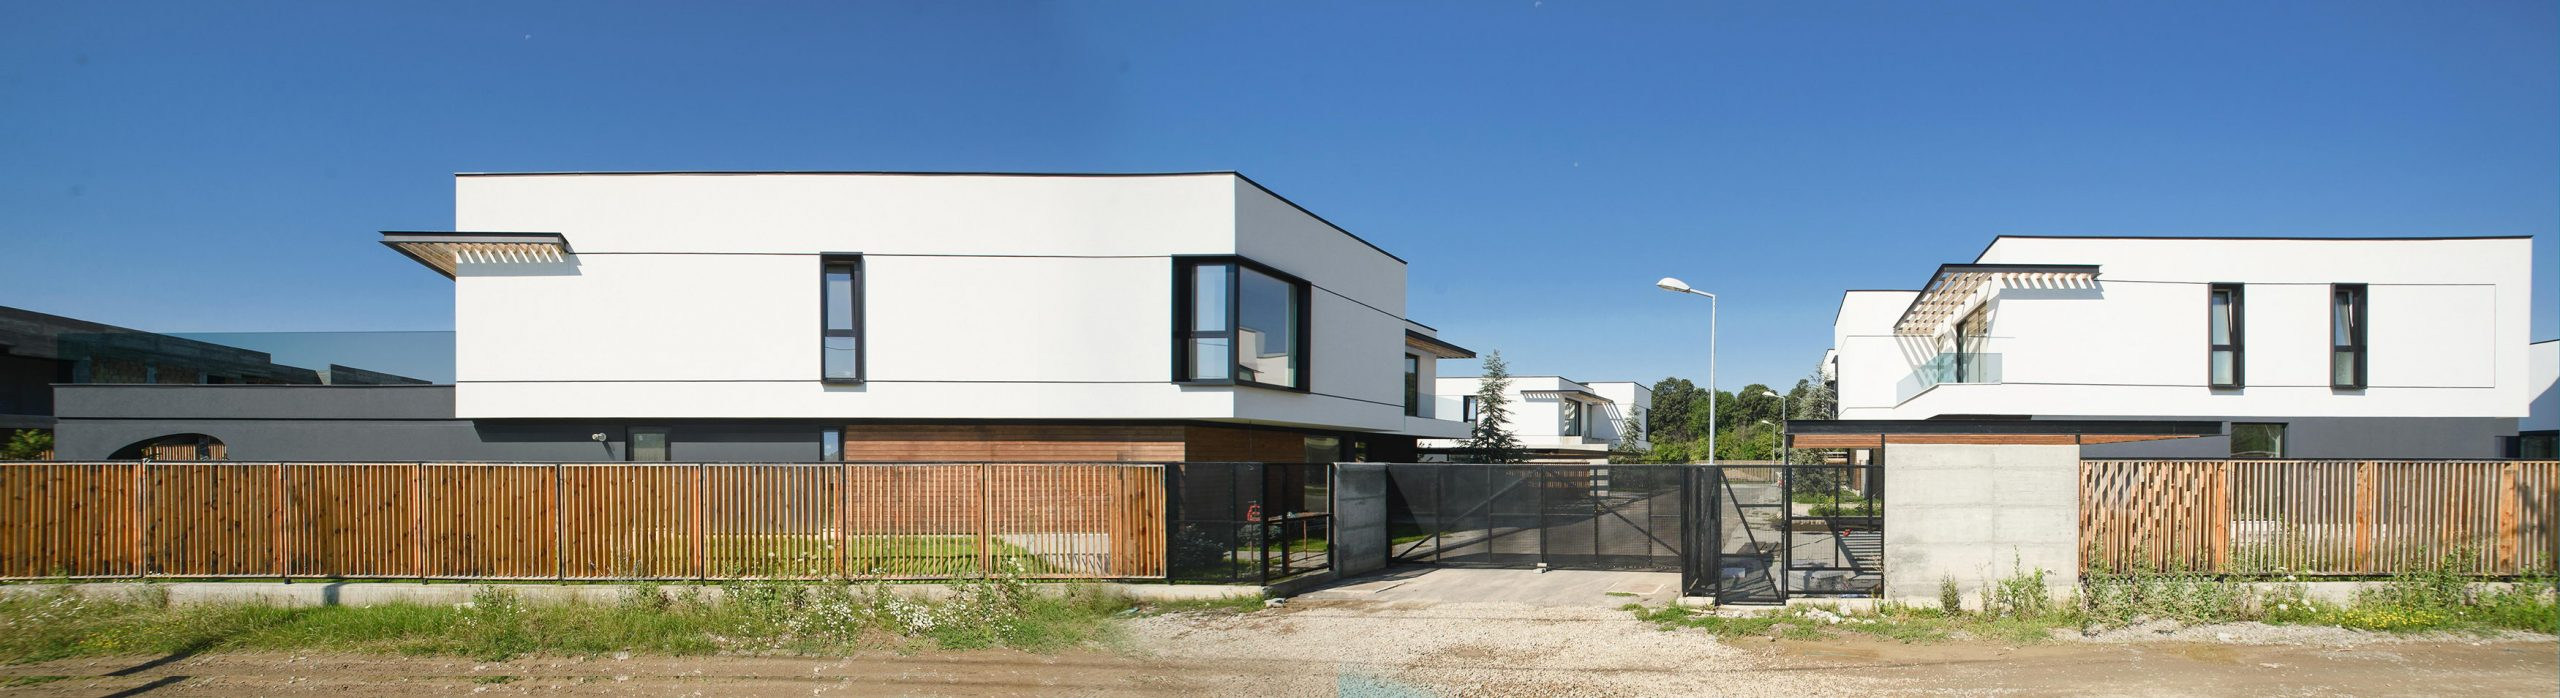 https://nbc-arhitect.ro/wp-content/uploads/2020/10/NBC-Arhitect-_-Arcstil_Residence-_-Romania-_-exterior-view_6-scaled.jpg